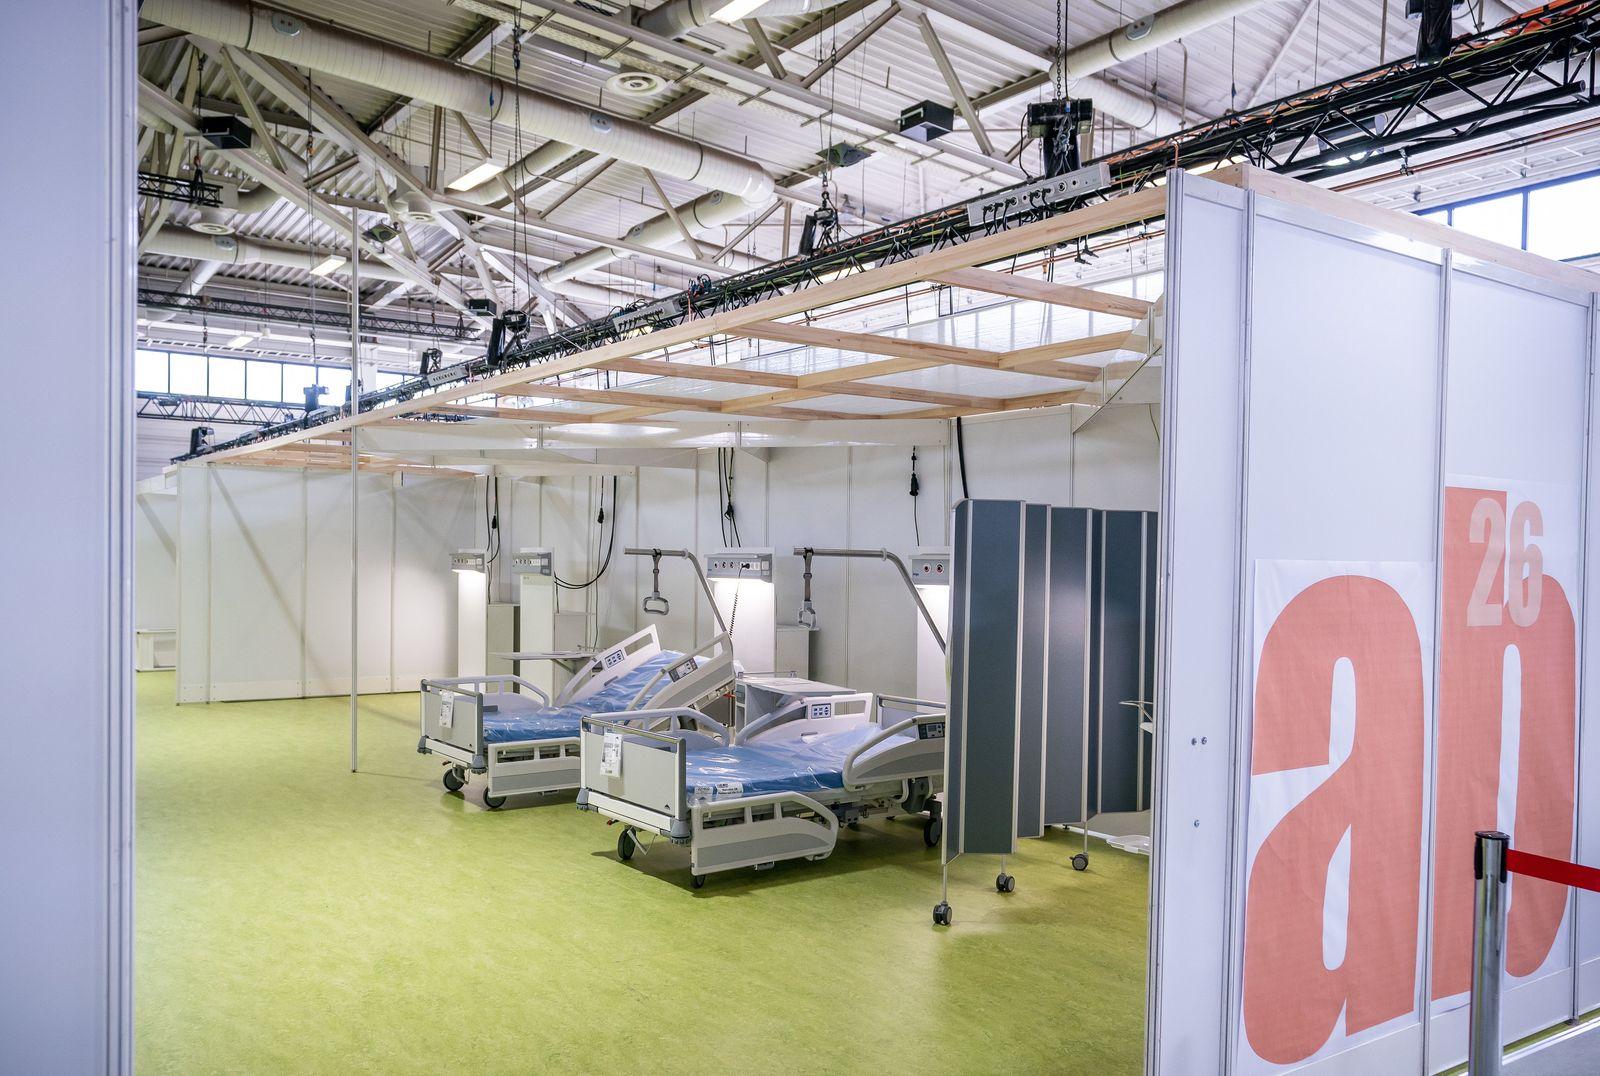 Coronavirus - Behandlungszentrum Messe Berlin